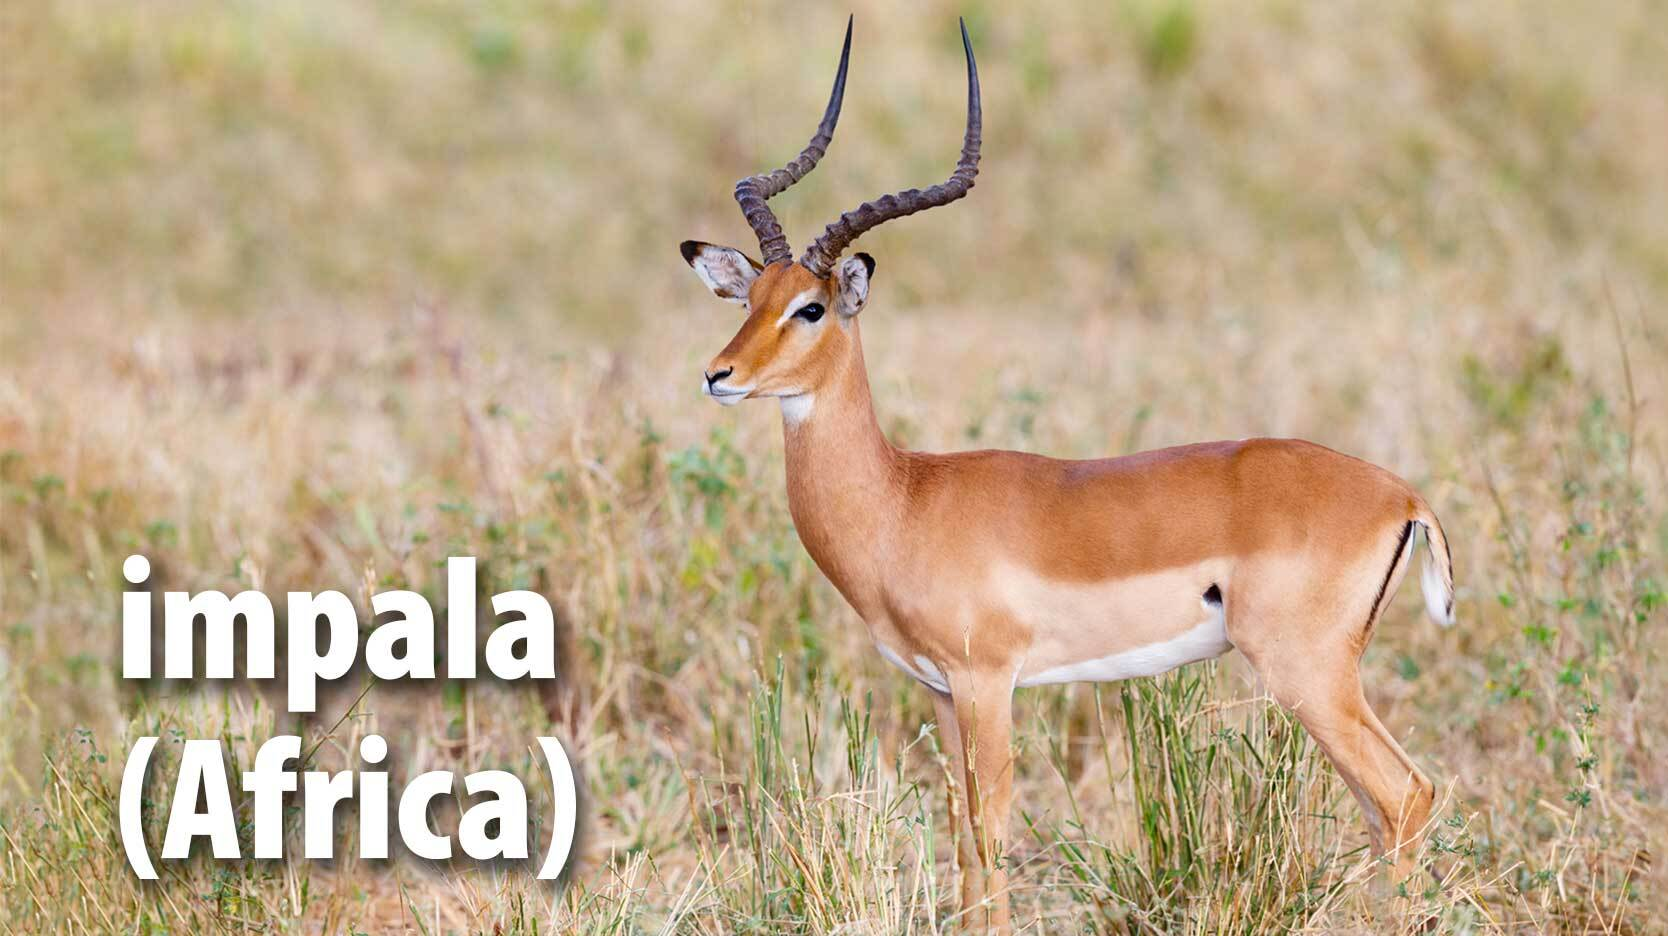 impala mammal from Africa